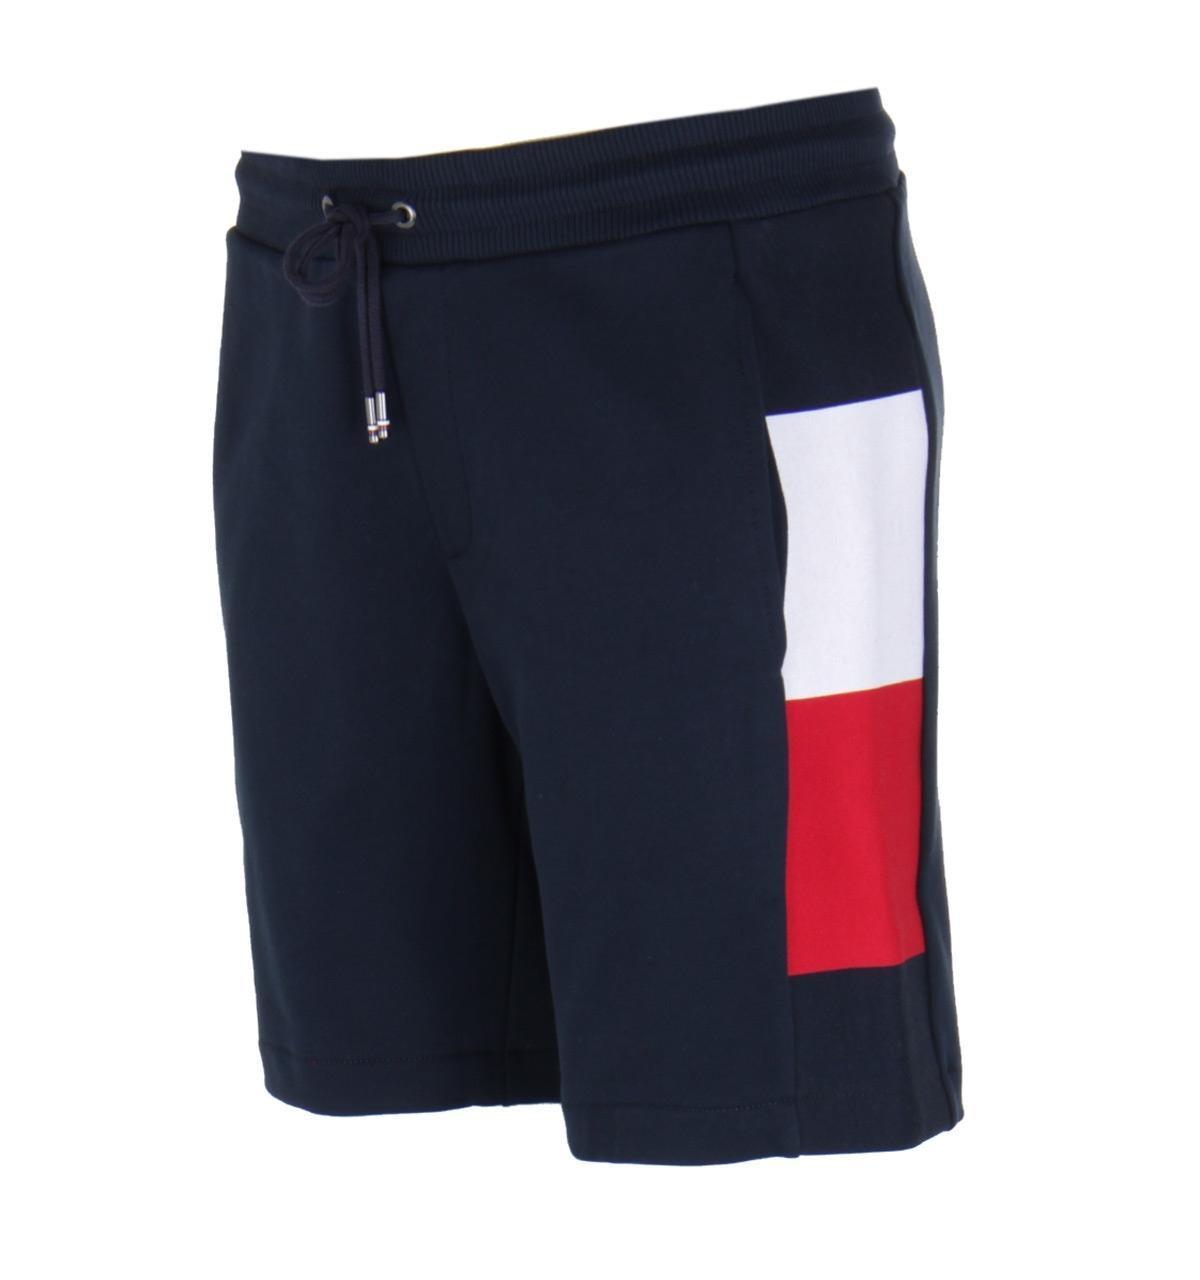 96986160c3c Lyst - Tommy Hilfiger Flag Rib Insert Navy Sweat Shorts in Blue for Men